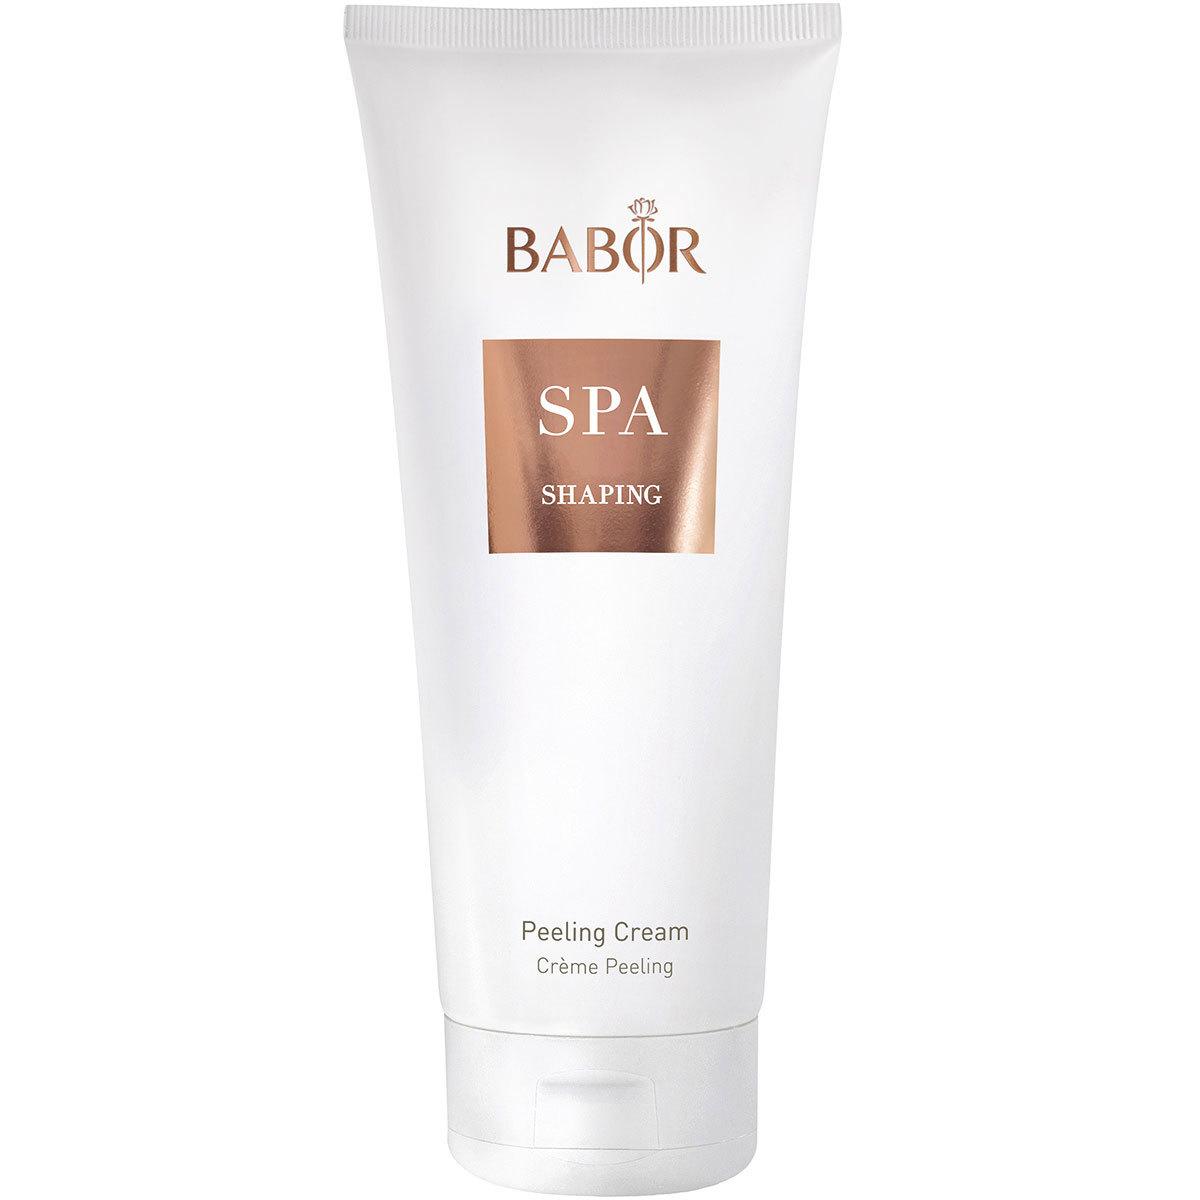 Крем-пилинг подтягивающий для тела Babor Spa Shaping For Body Peeling Cream 200 ml